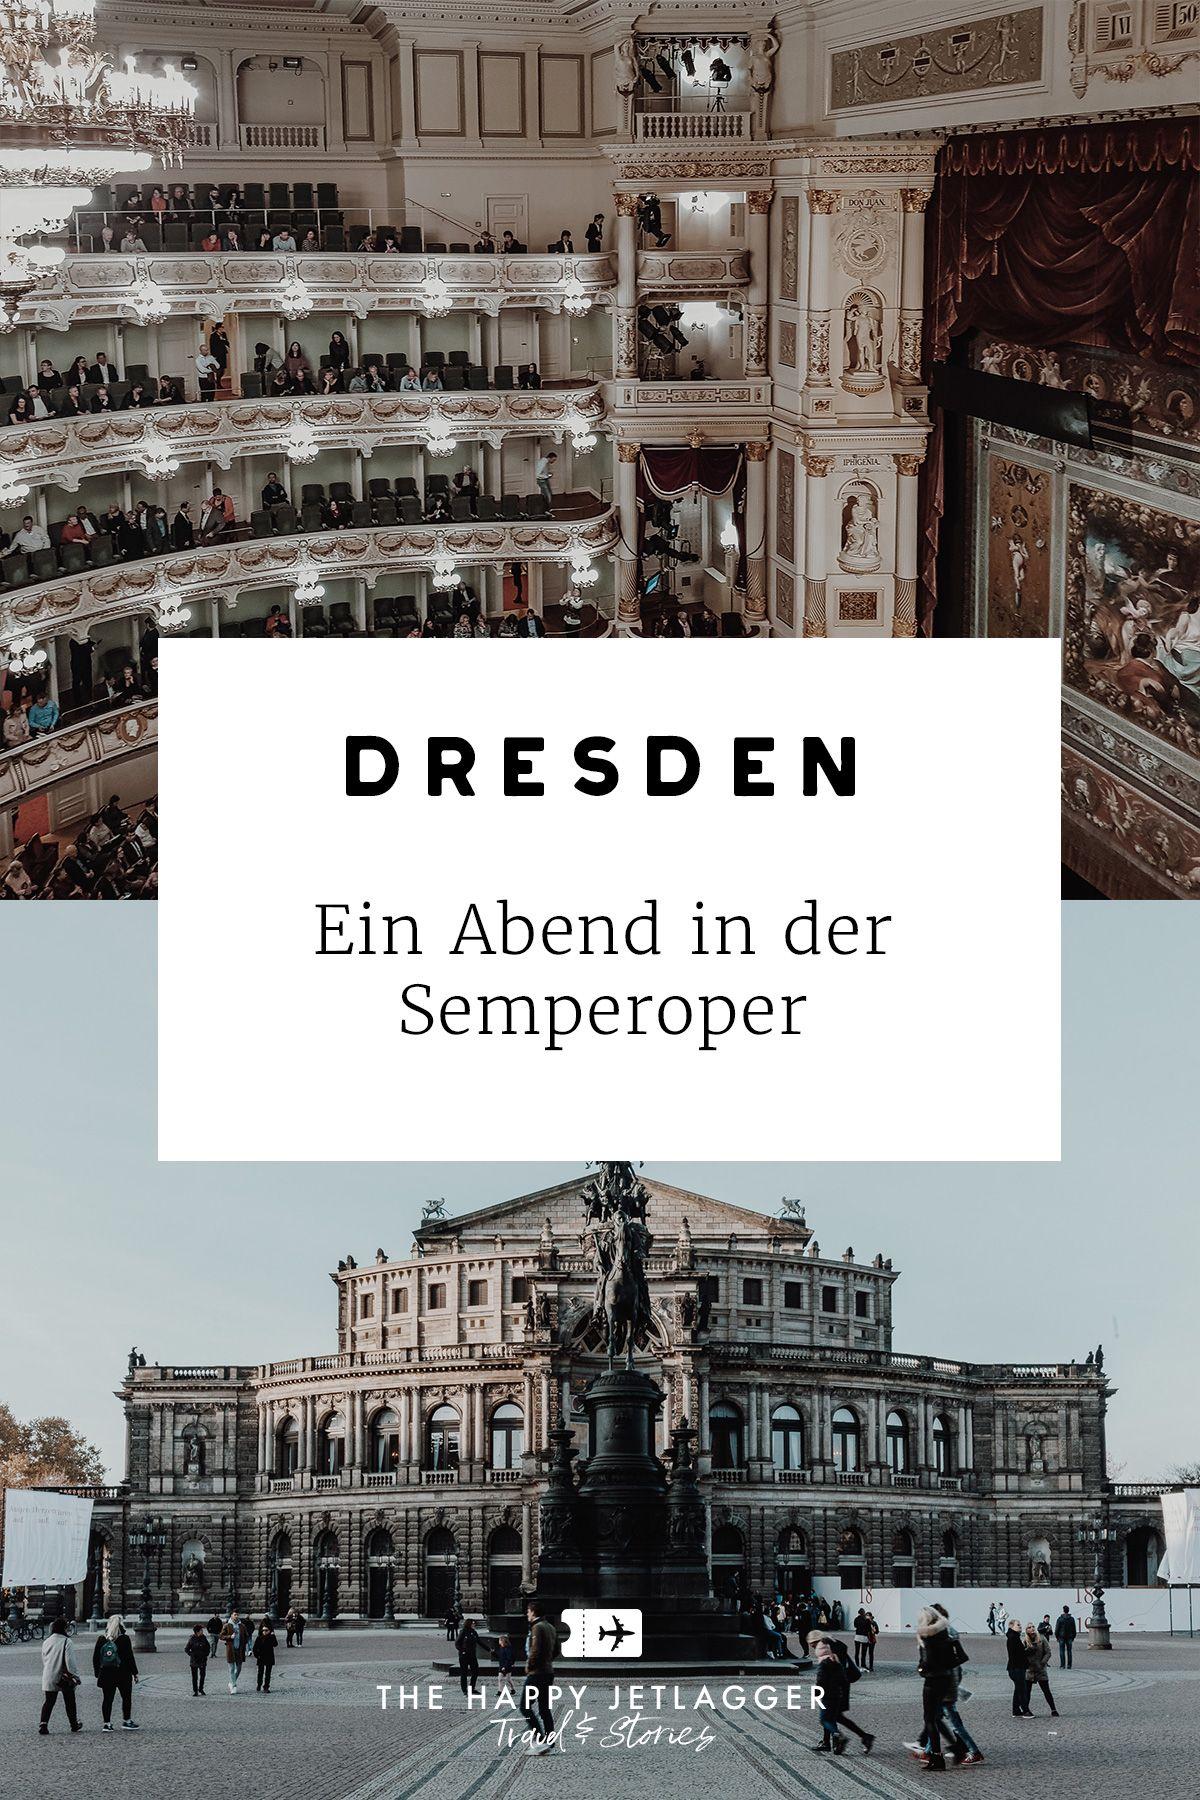 Semperoper Dresden Fuhrung Oper Mit Tipps Fur Gute Platze Semperoper Dresden Semper Oper Kurztrip Europa